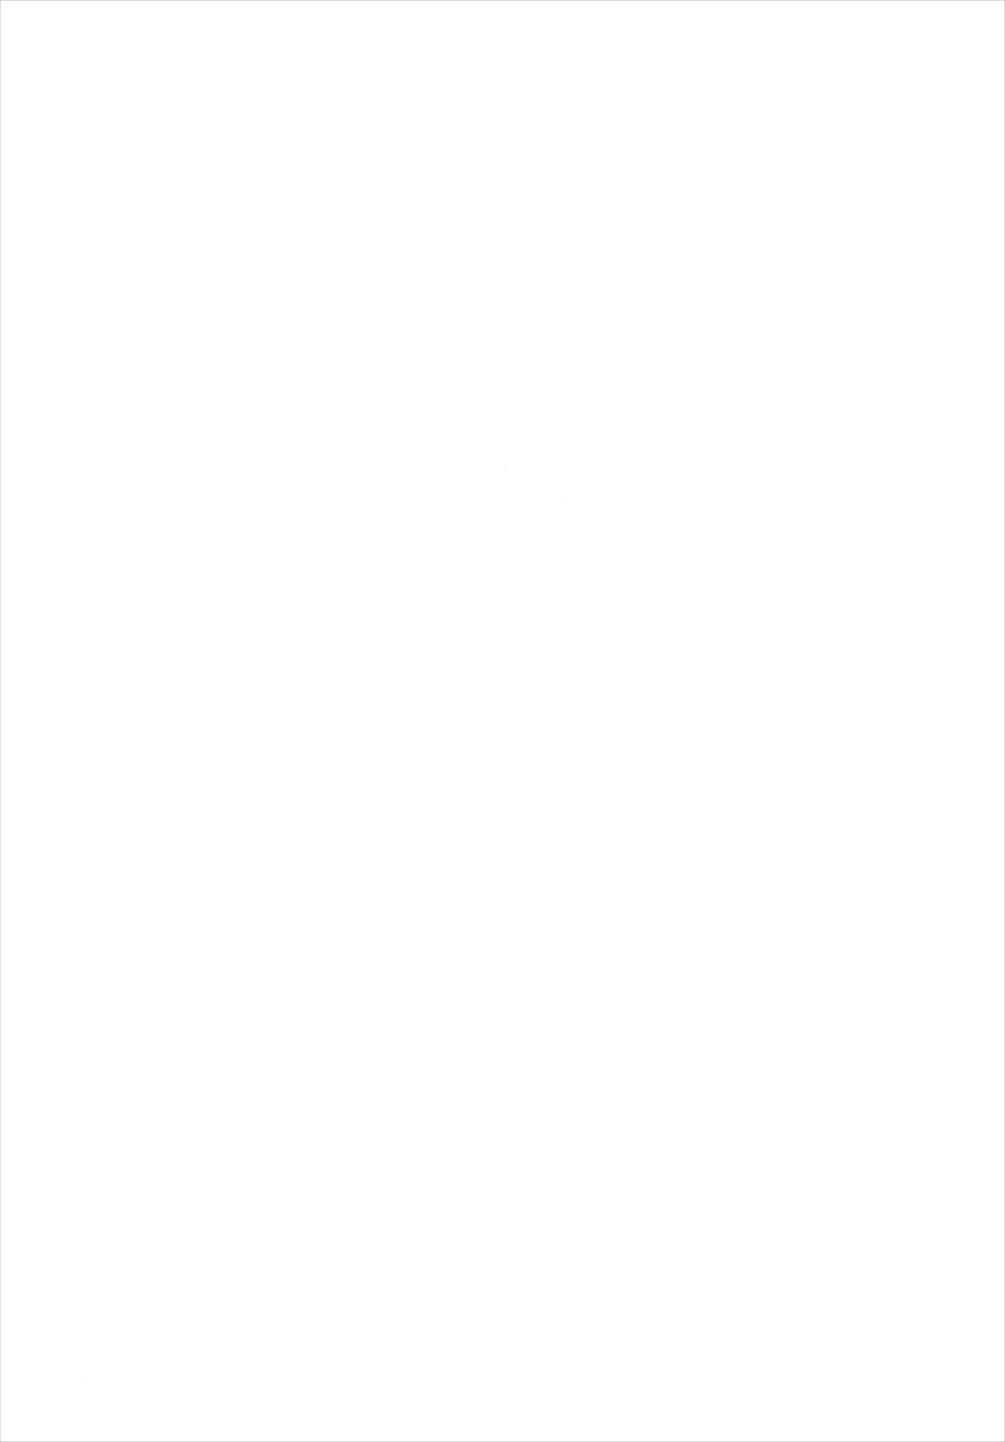 (C93) [Ugokuna pharmacy θ (ababari)] Martina ga Puff-Puff jou no Kawari ni Puff-Puff Shite Kureru Hon (Dragon Quest XI) 22